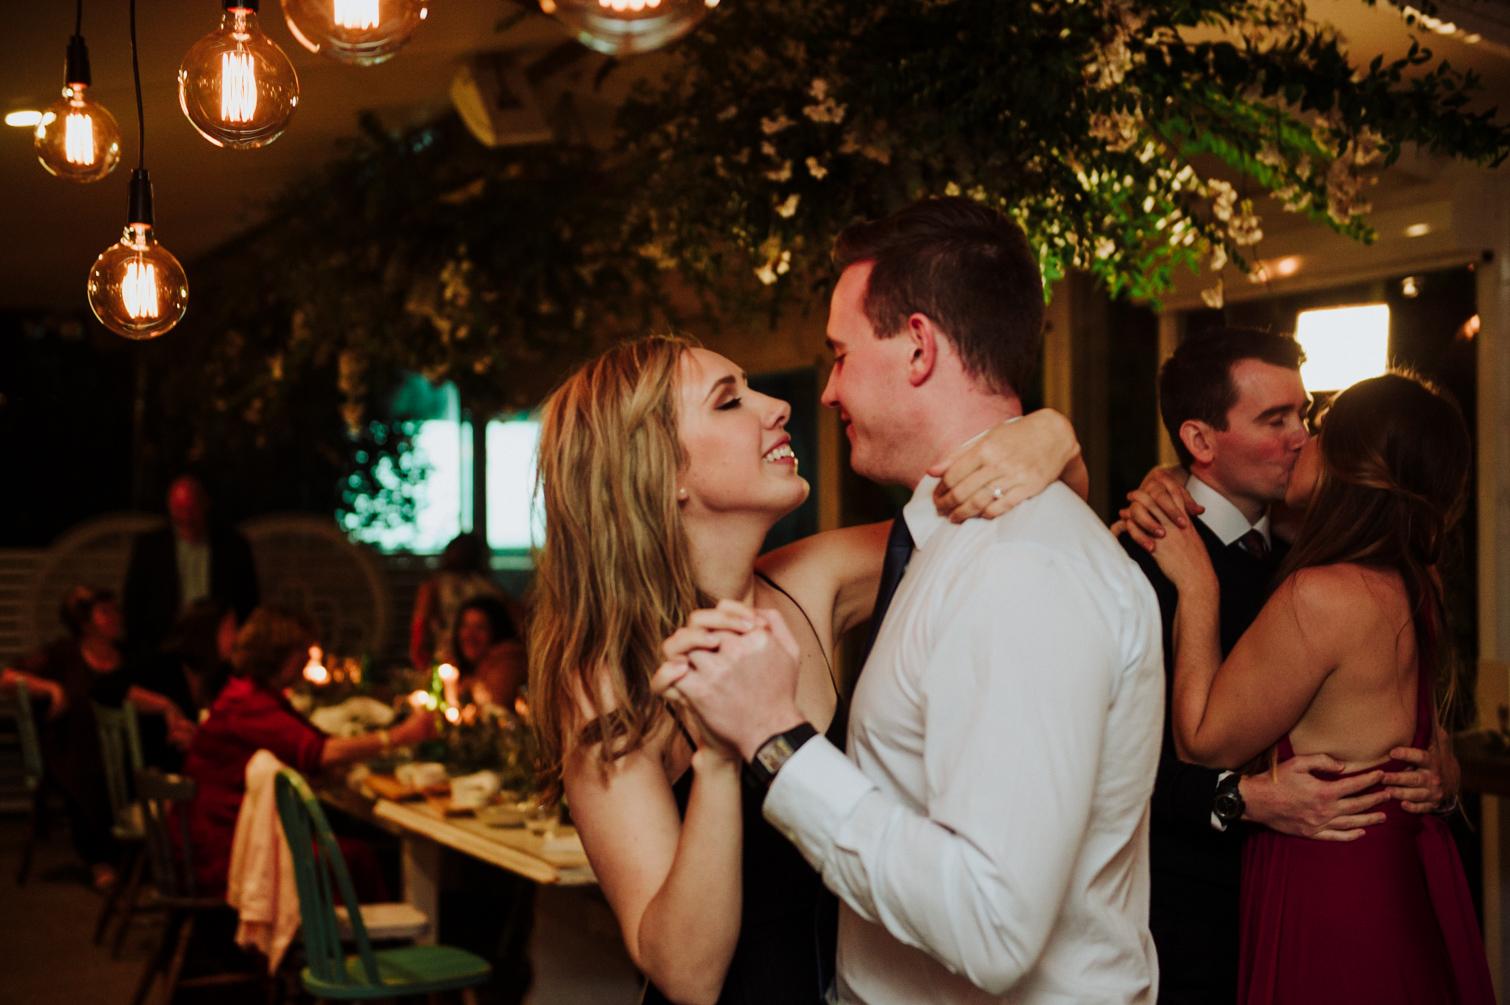 The_Belongil_Byron_Bay_Weddings_New_Black_Studios-236.jpg